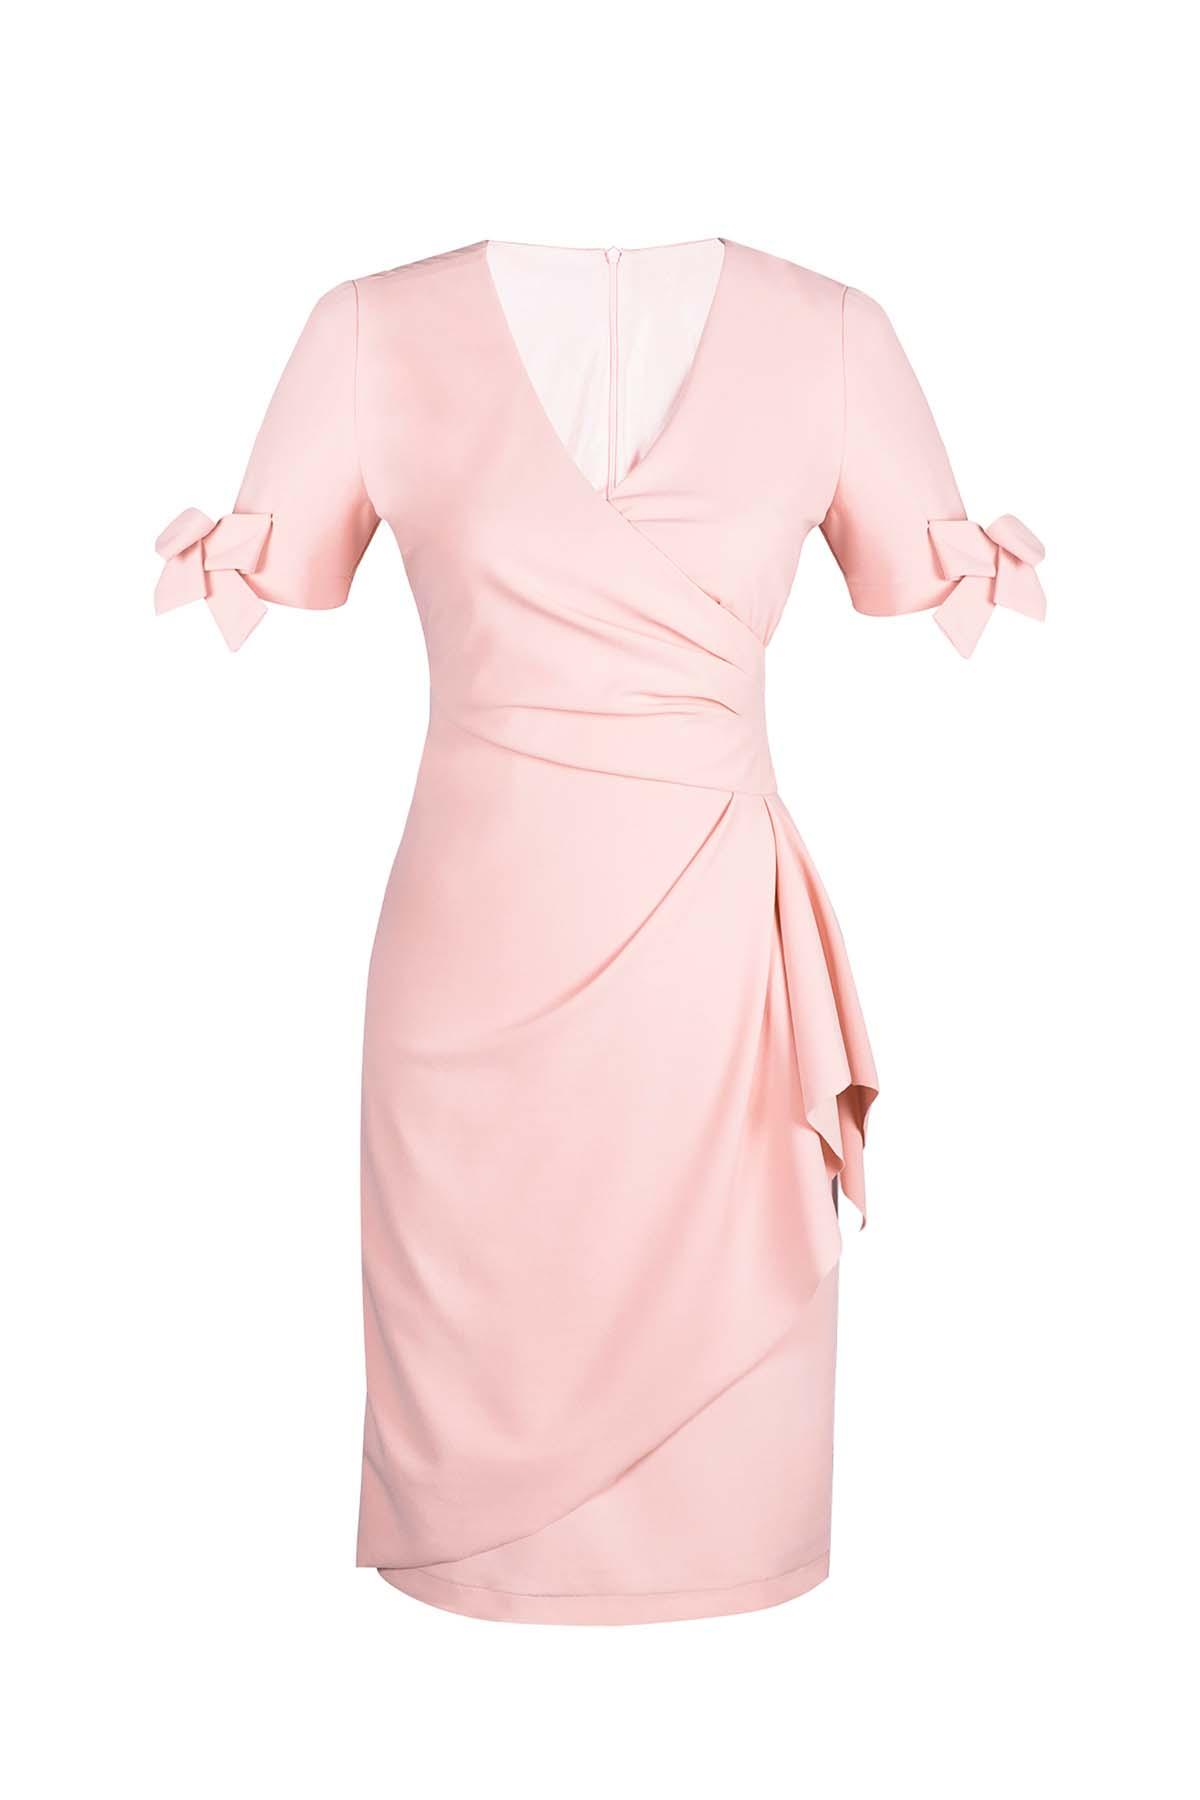 Teria Yabar - Vestido mini en rosa